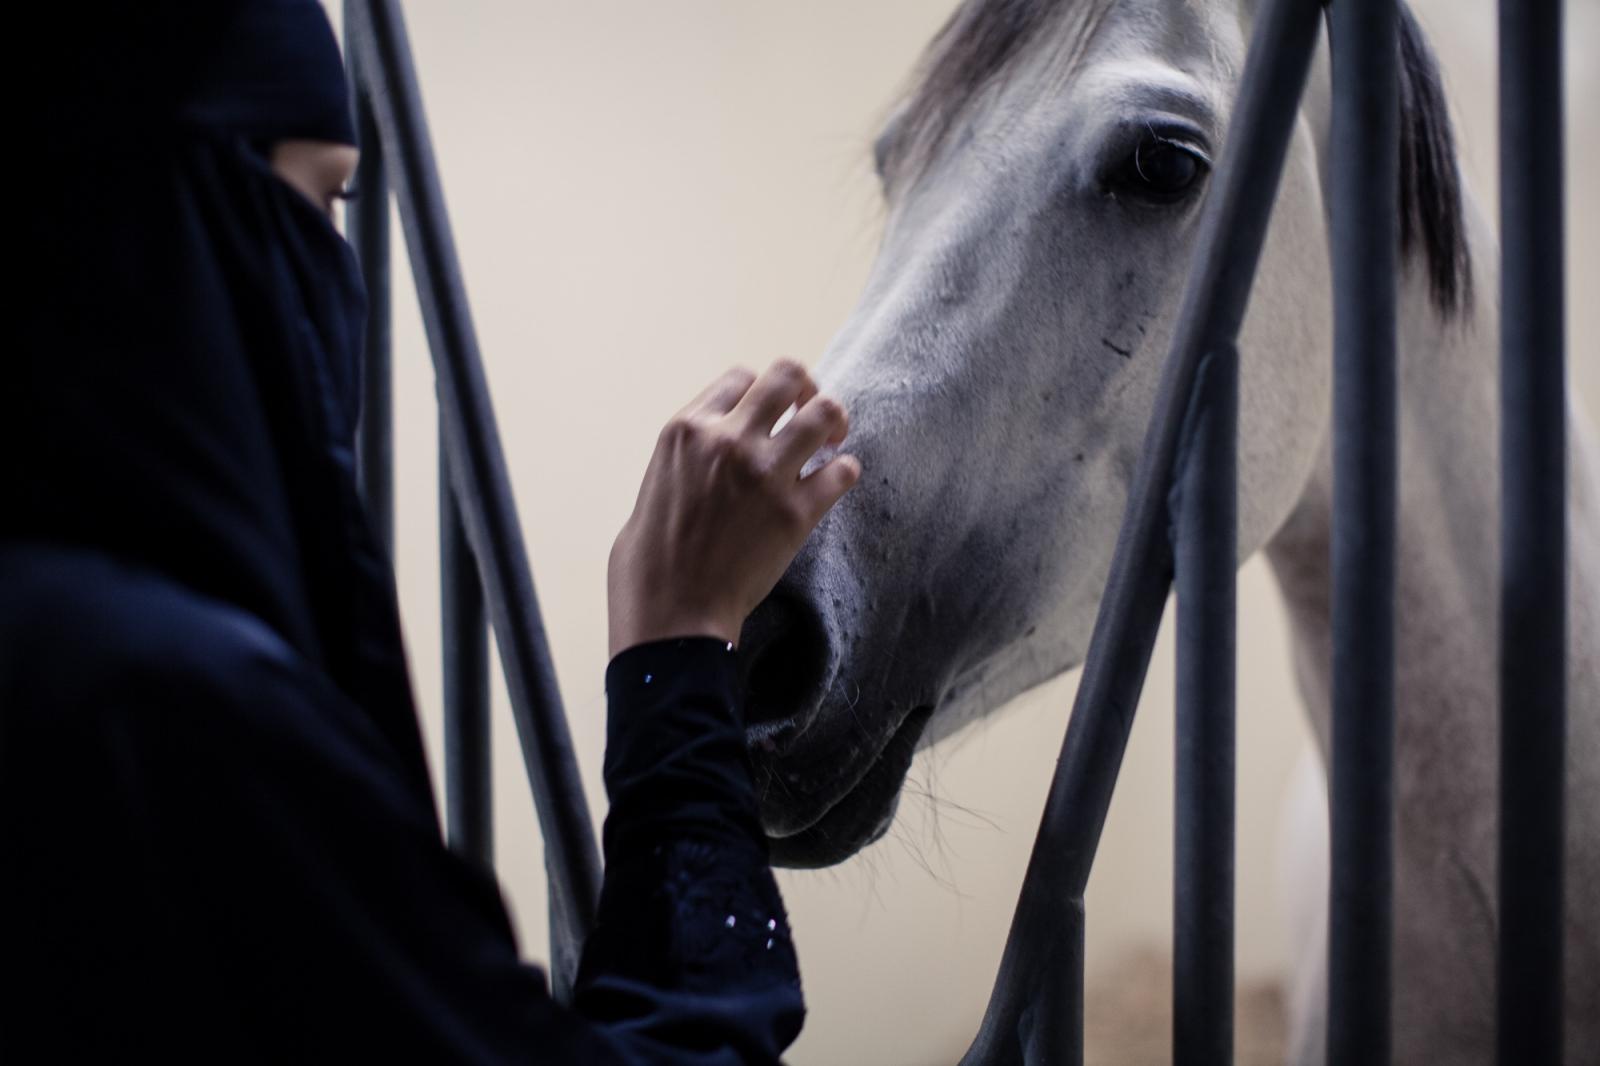 'Empathy'. Dubai, UAE, Deecember 2014.